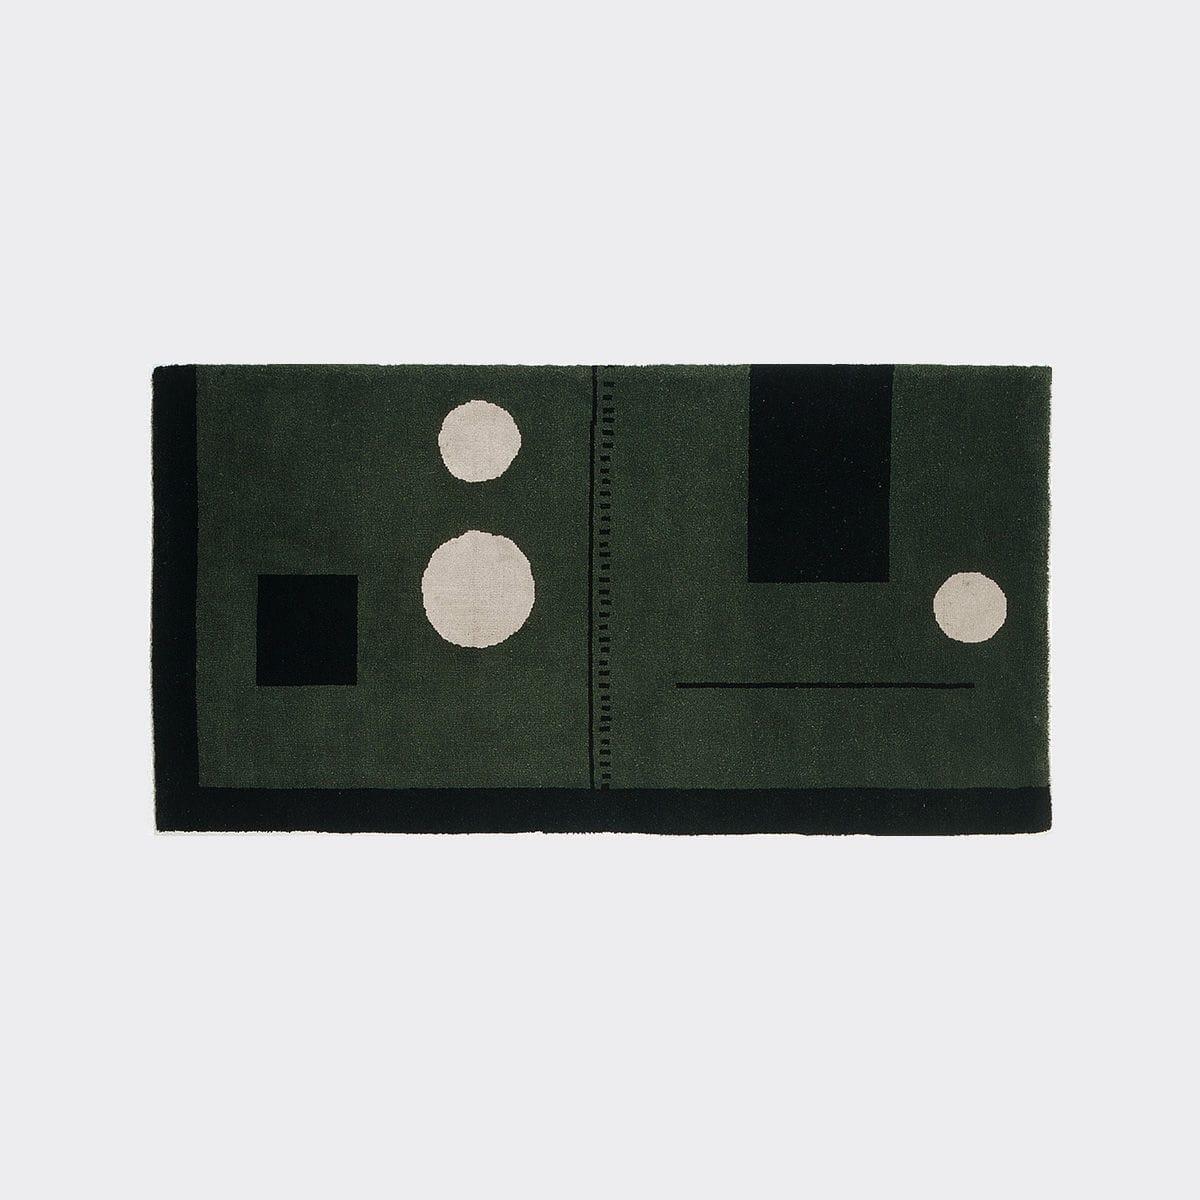 eileen gray rug contemporary patterned wool irish